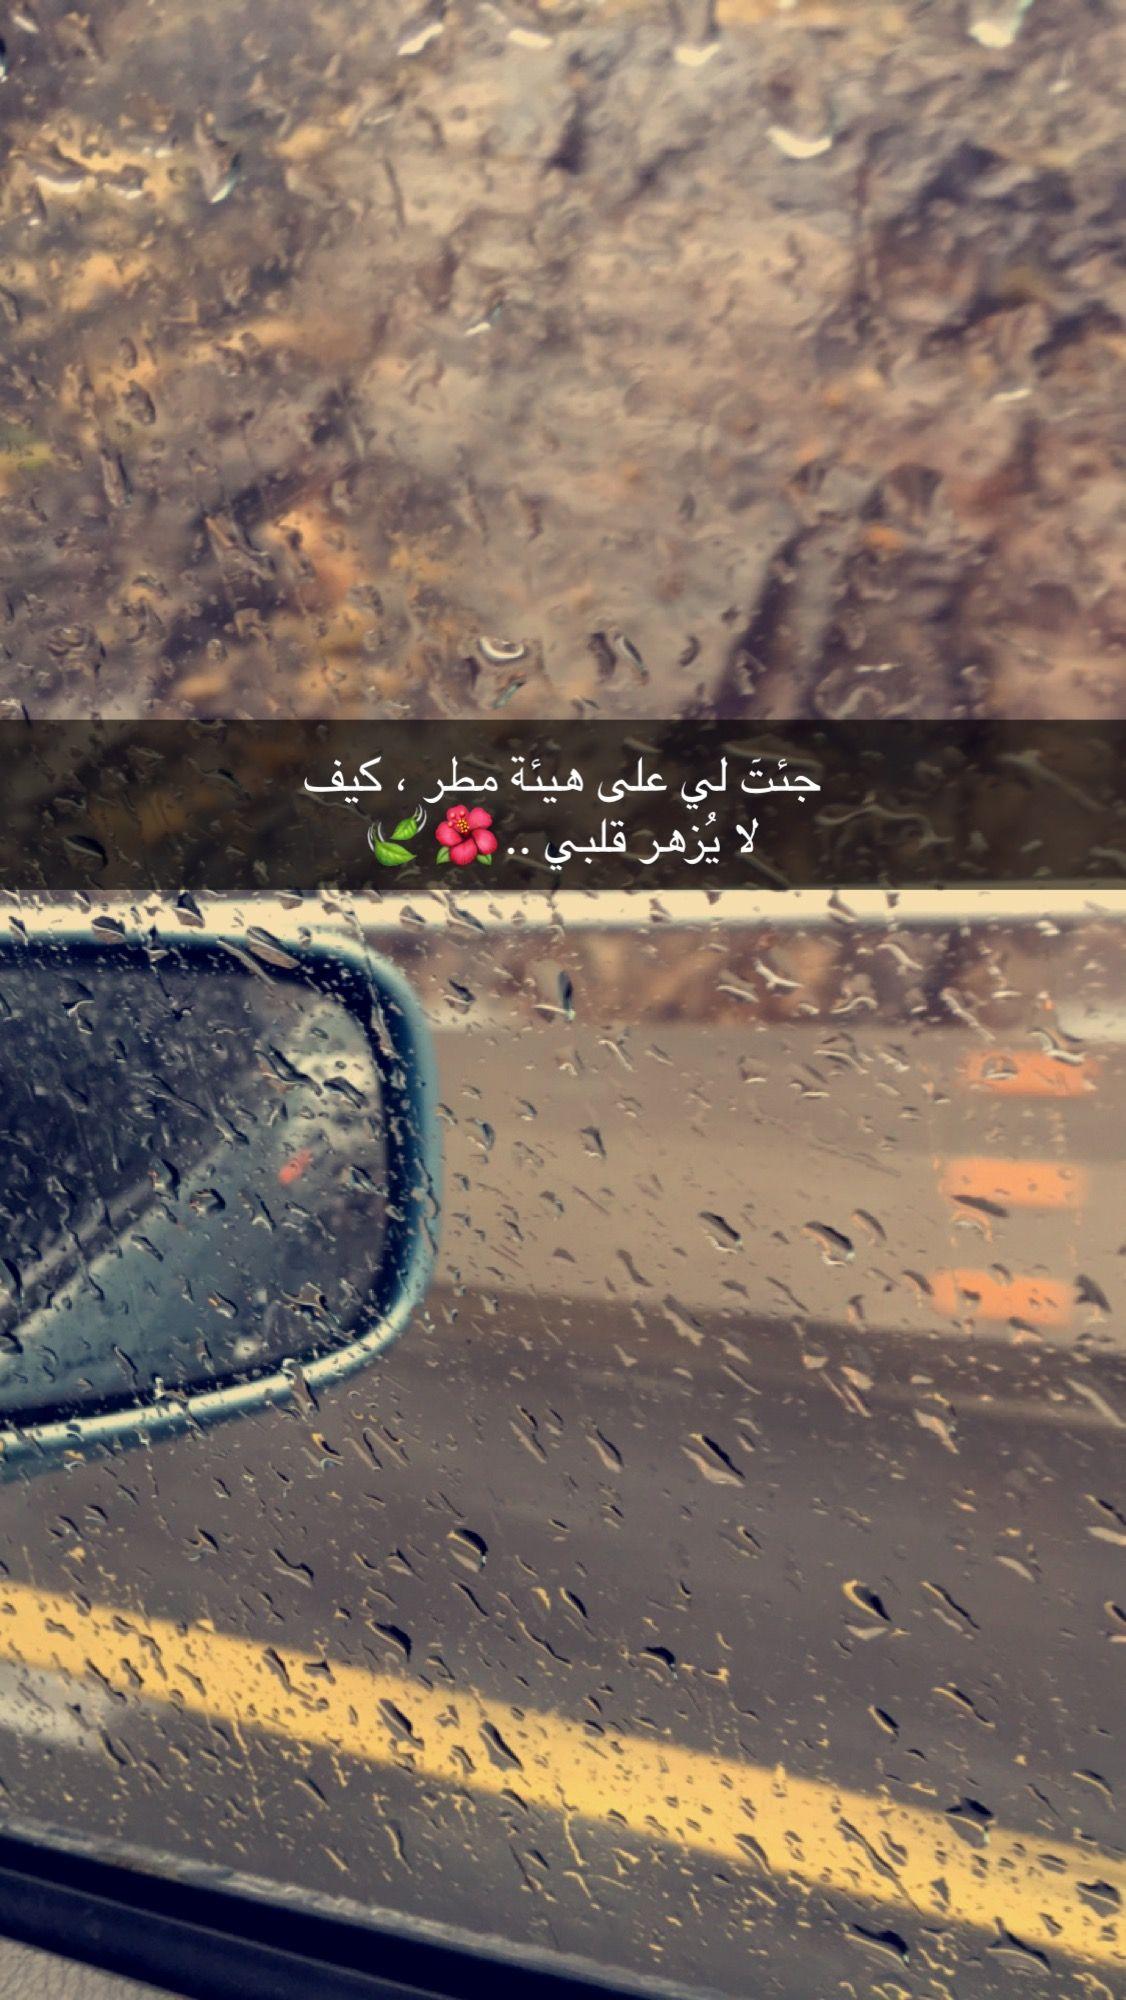 Pin By Naz Youya On جماليات Funny Arabic Quotes Arabic Love Quotes Beautiful Arabic Words